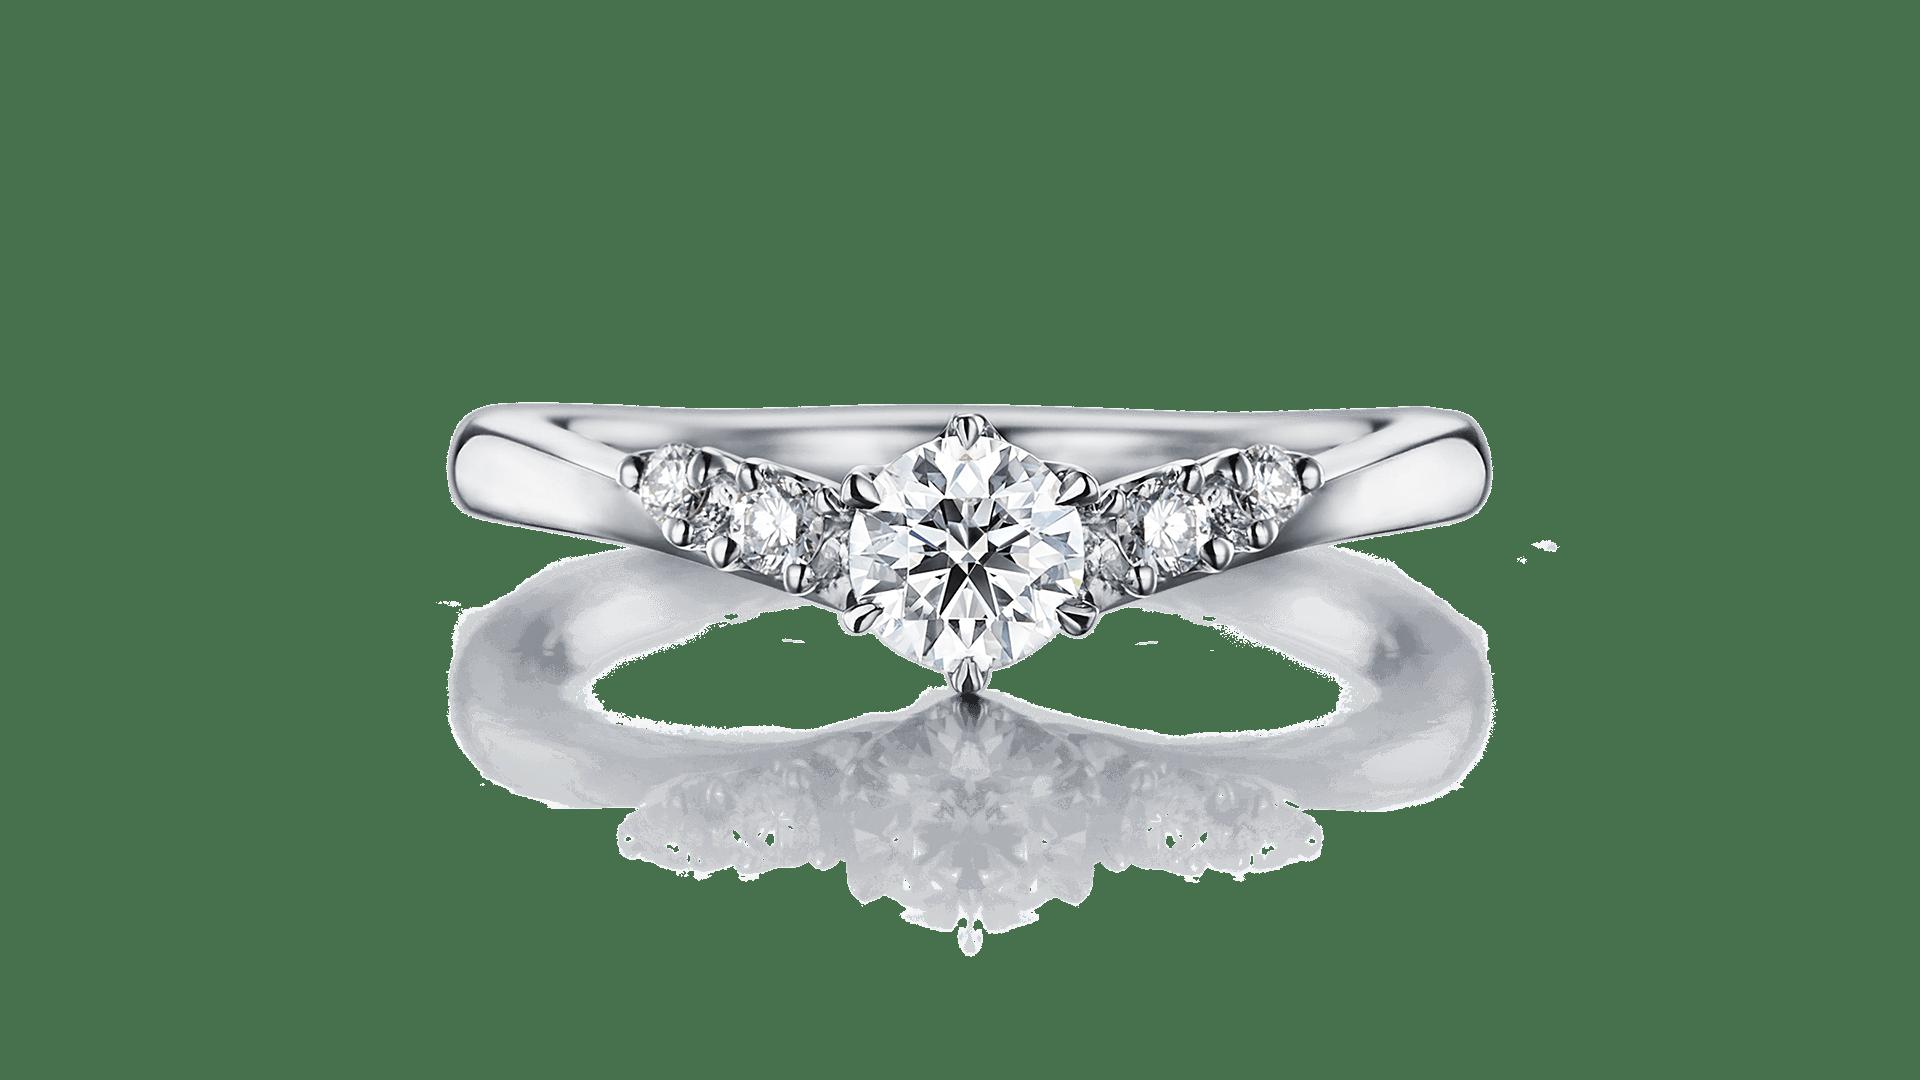 mizar ミザール | 婚約指輪サムネイル 1